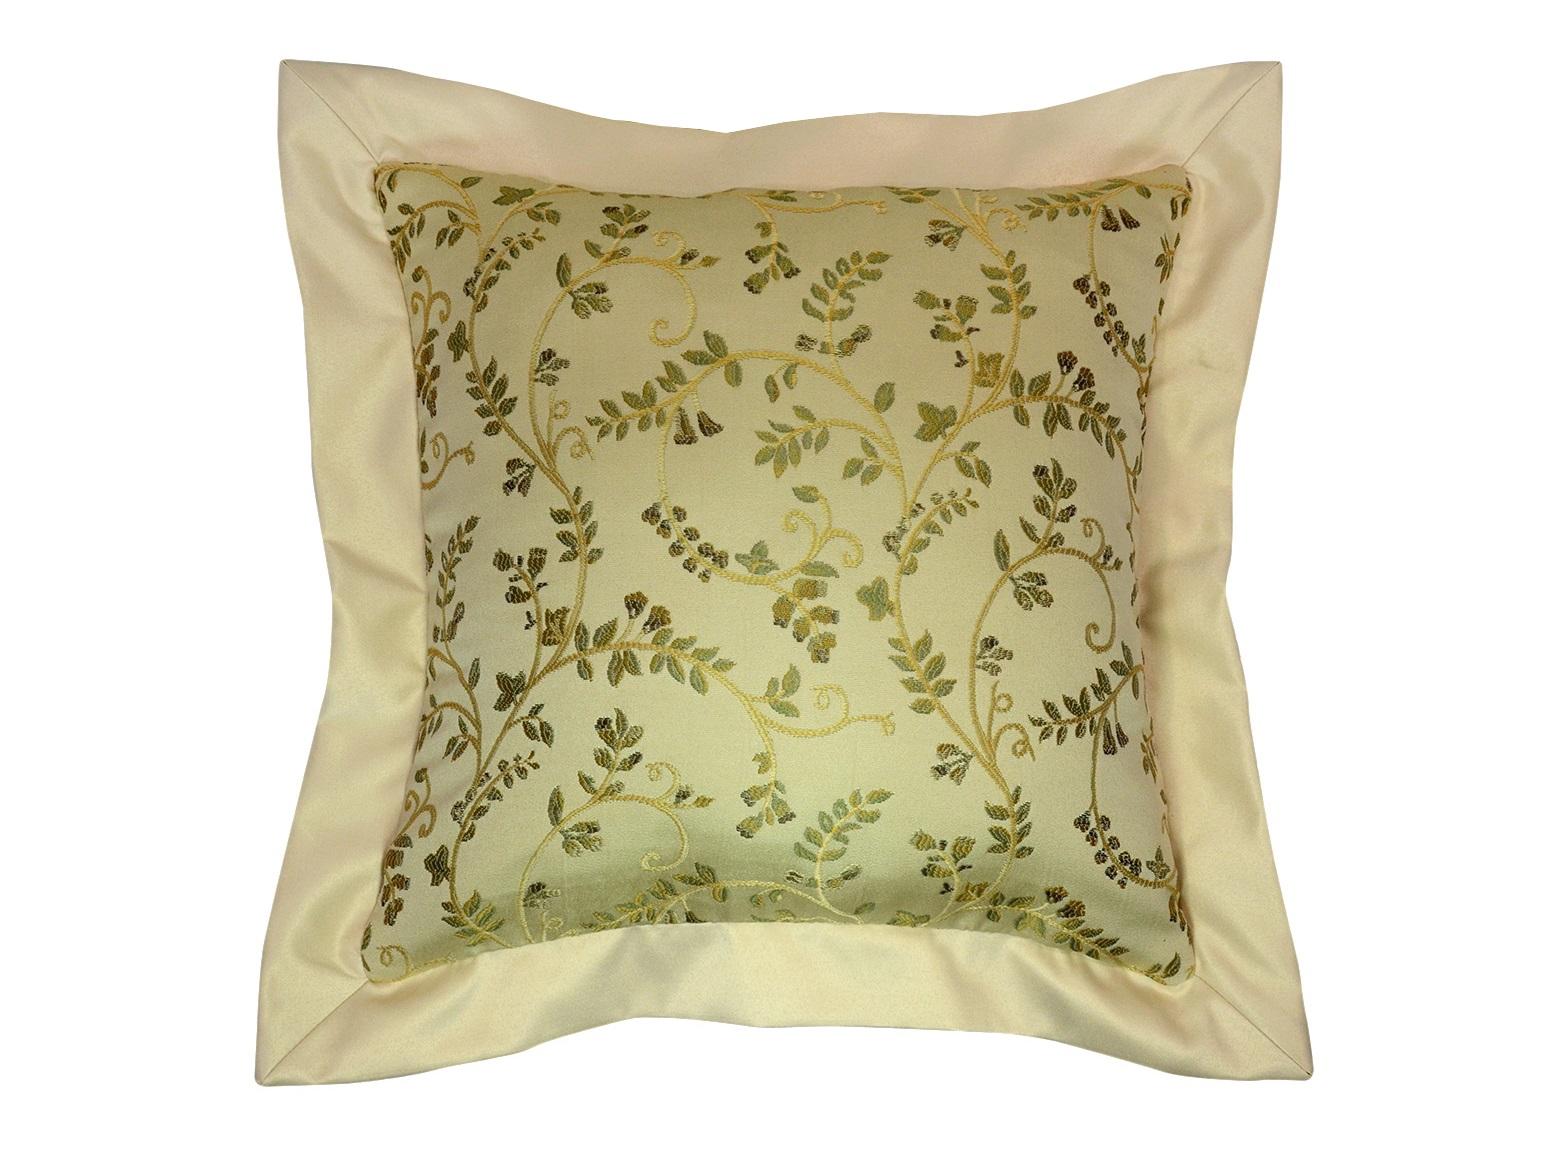 Подушка Arabelle GreenКвадратные подушки и наволочки<br>Декоративная  подушка .Чехол съемный.<br><br>Material: Вискоза<br>Length см: None<br>Width см: 50<br>Depth см: 15<br>Height см: 50